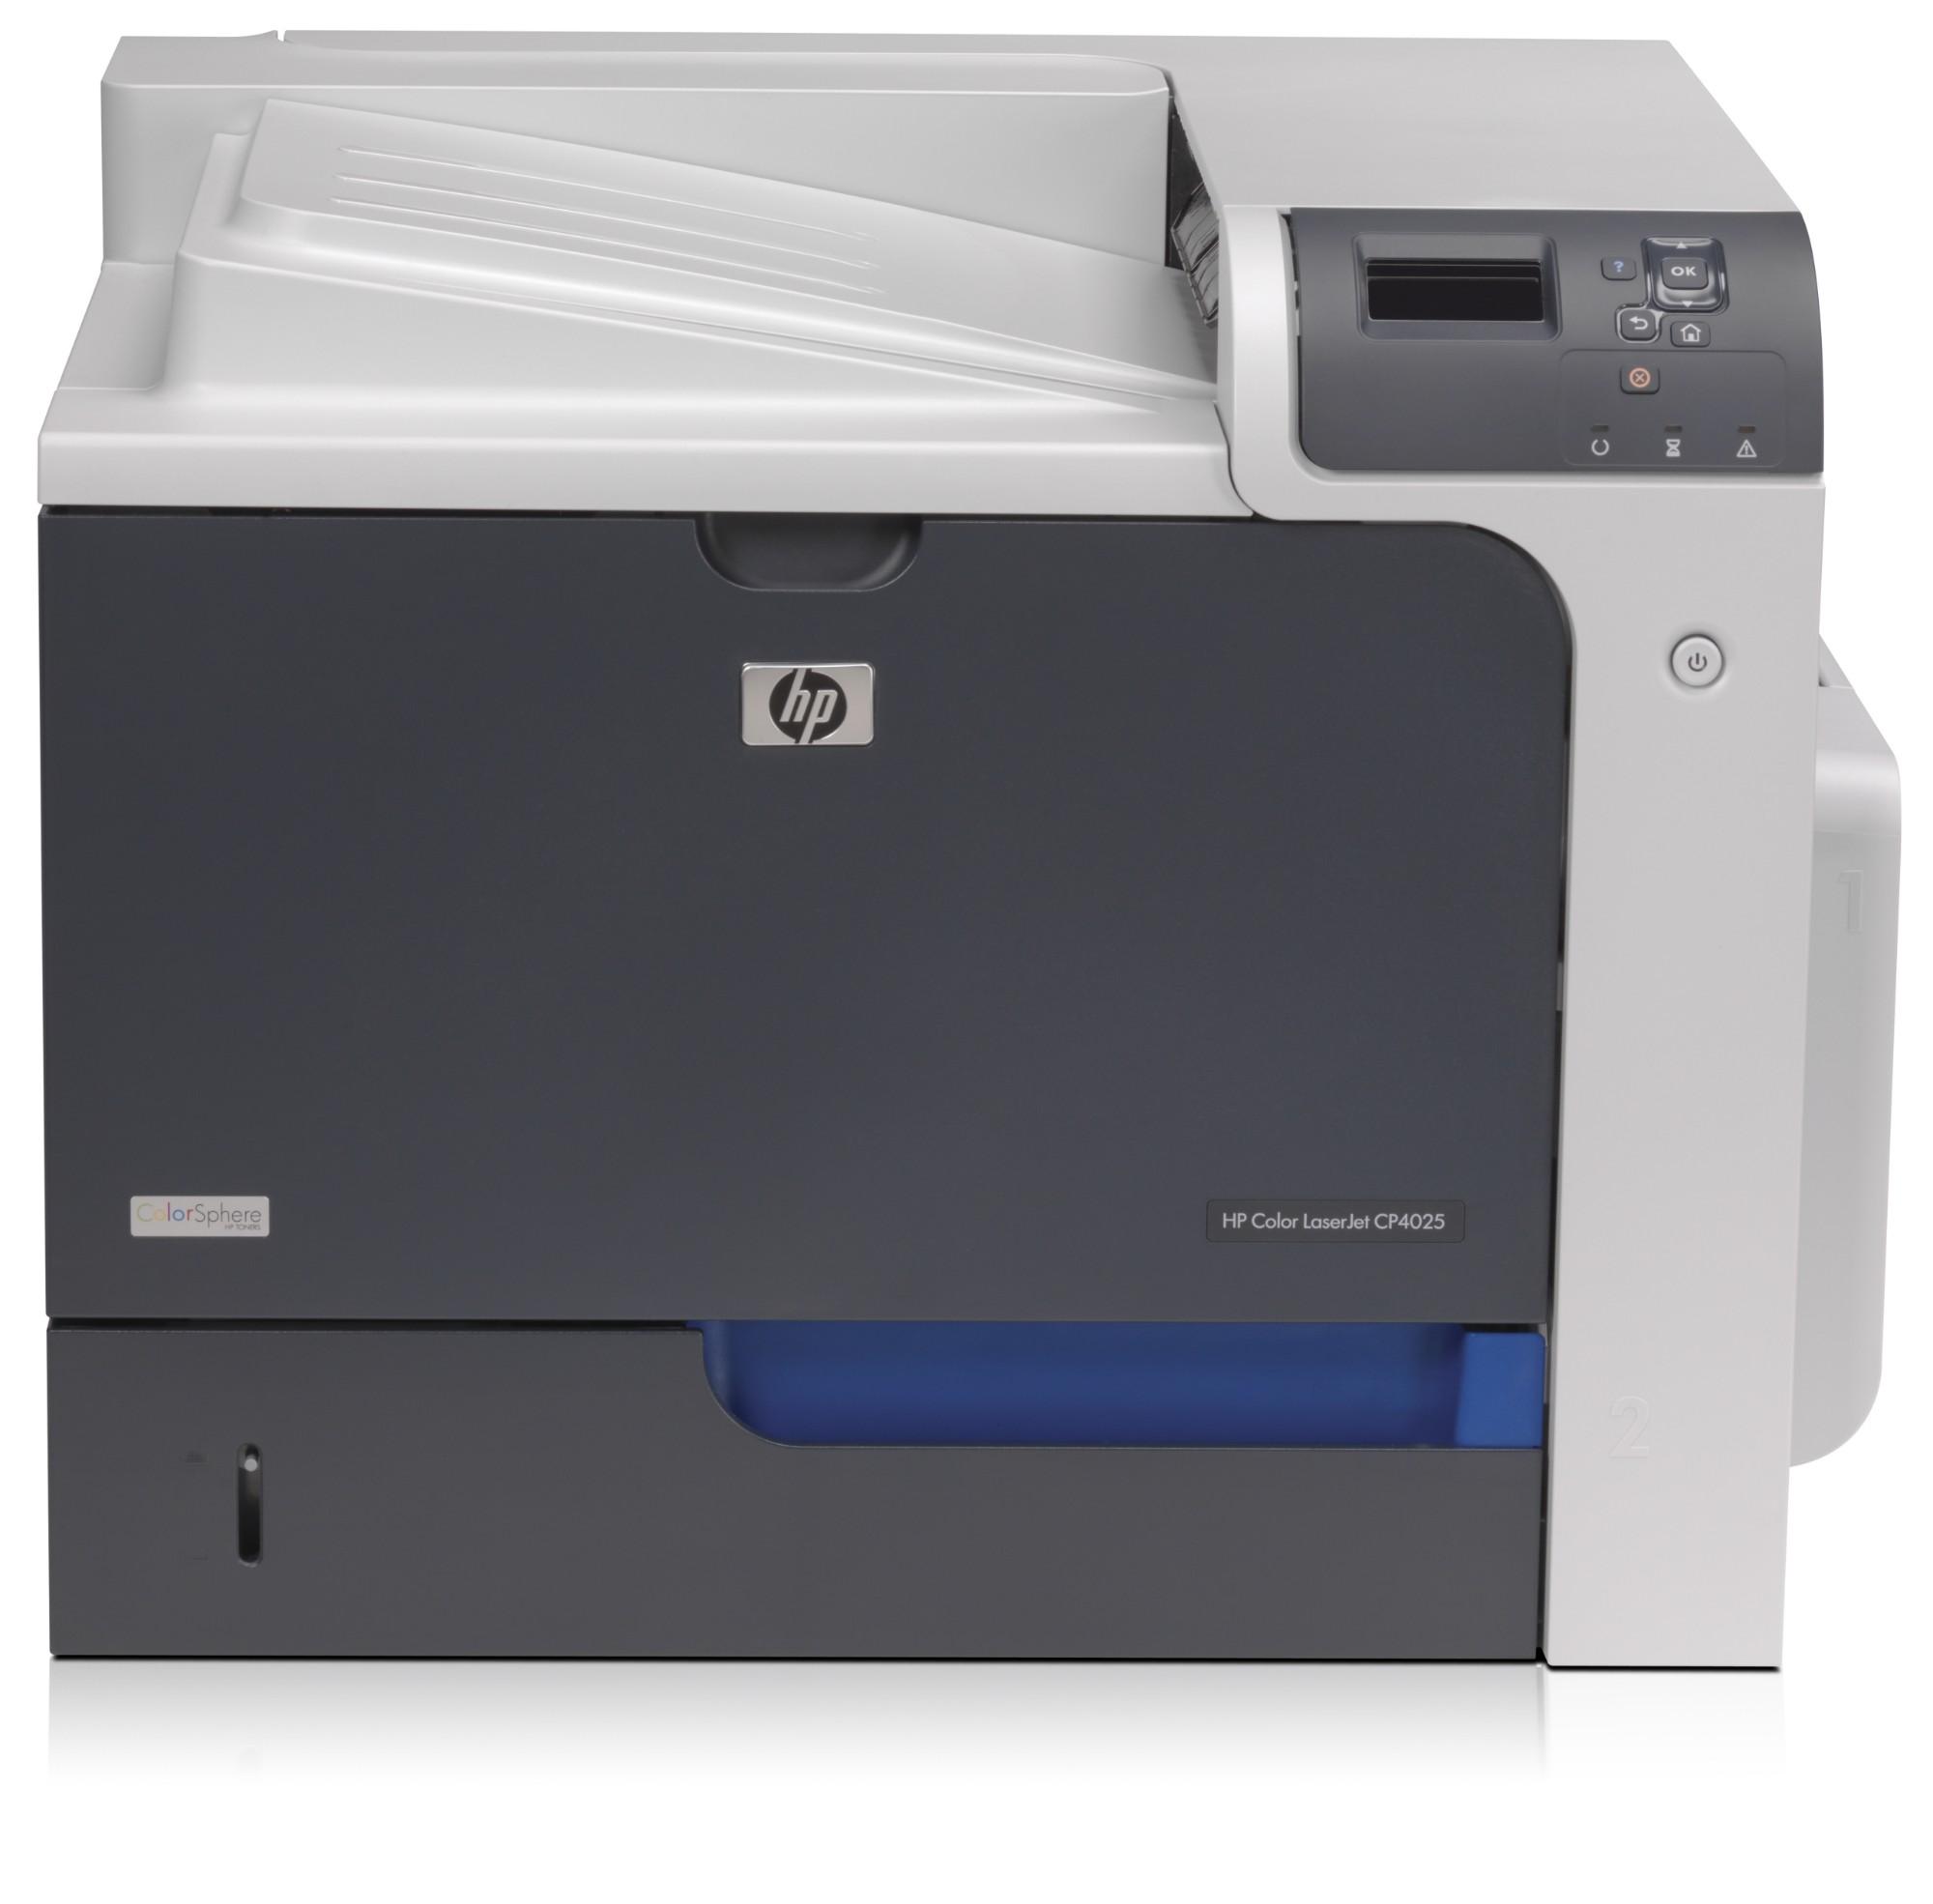 HP LaserJet Color Enterprise CP4025n Printer